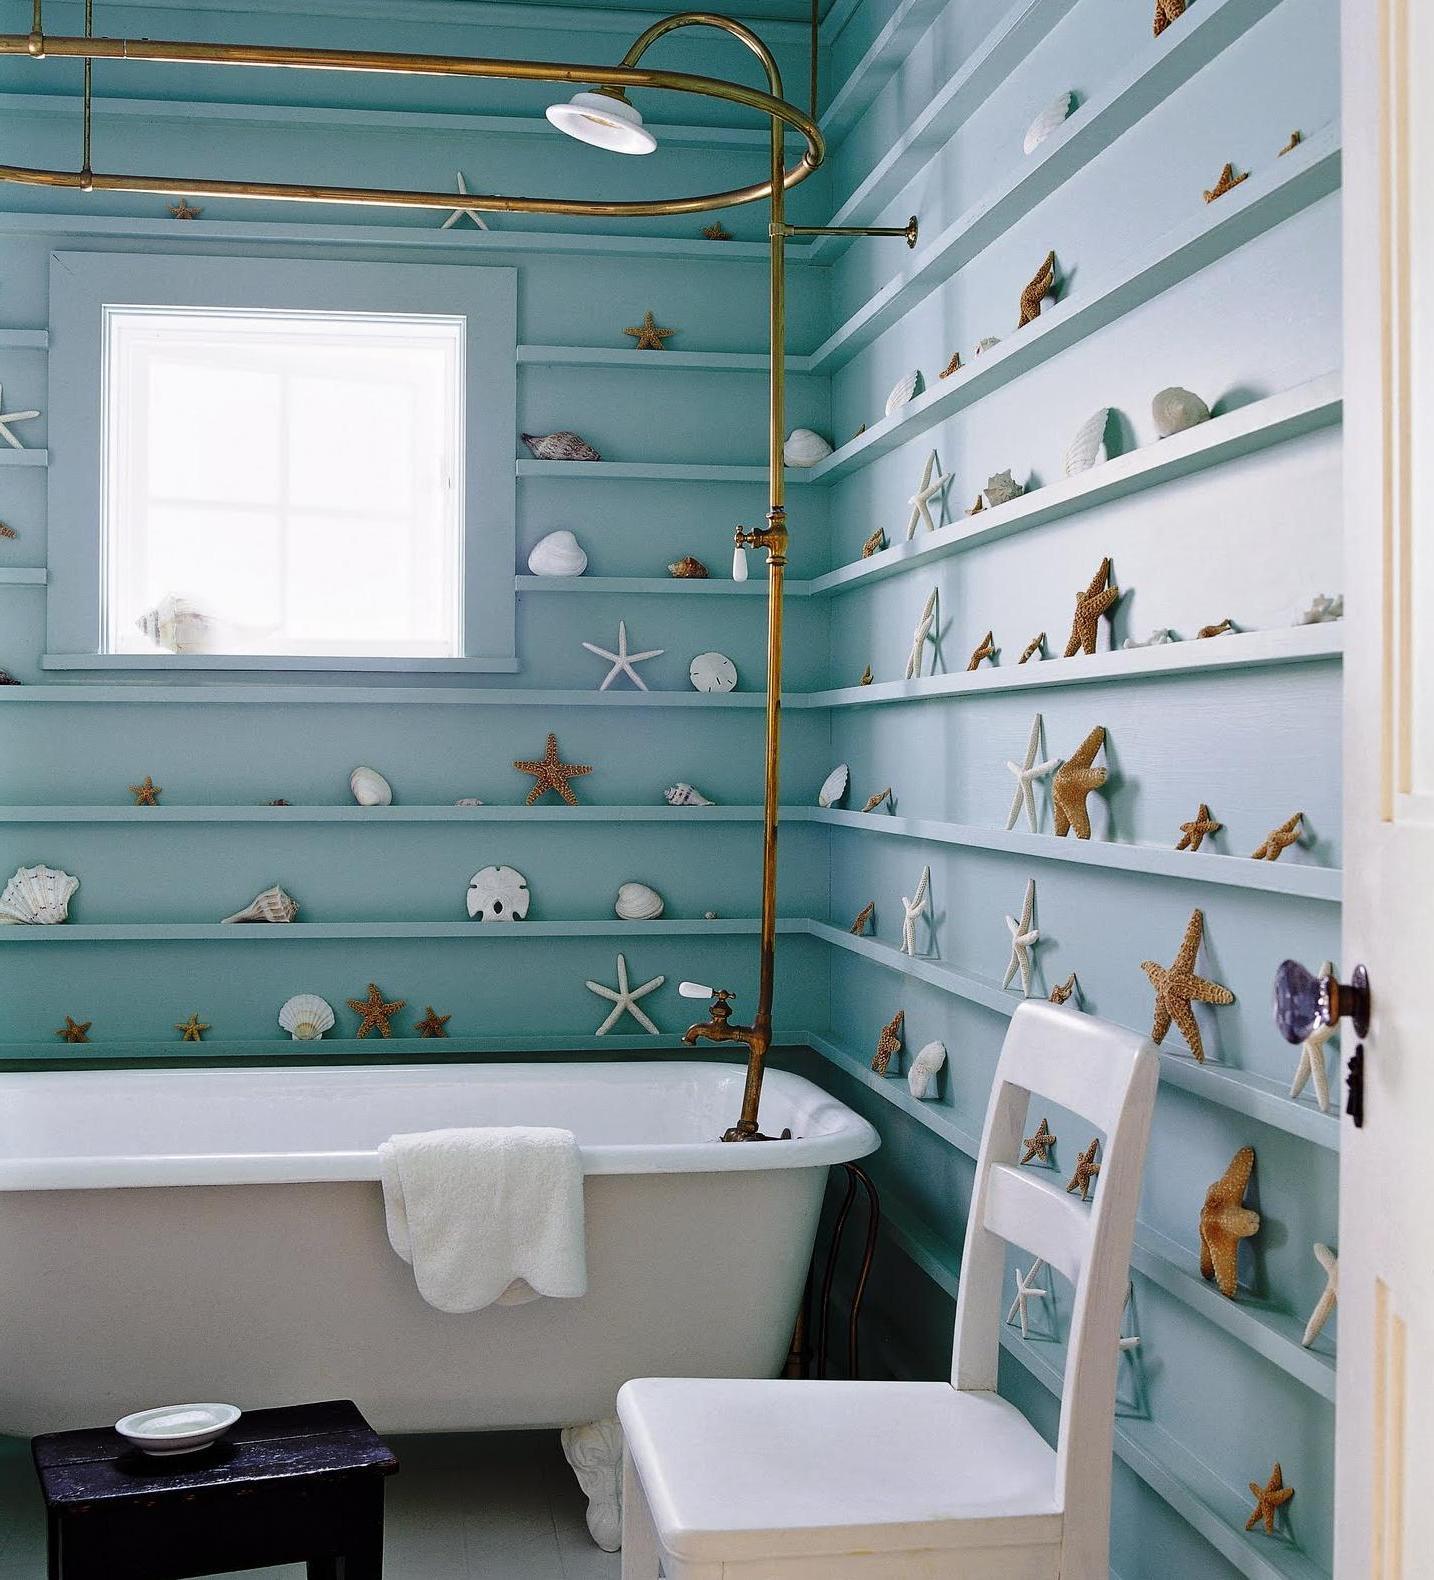 Starfish Figure Beach Themed Bathroom (Image 8 of 10)